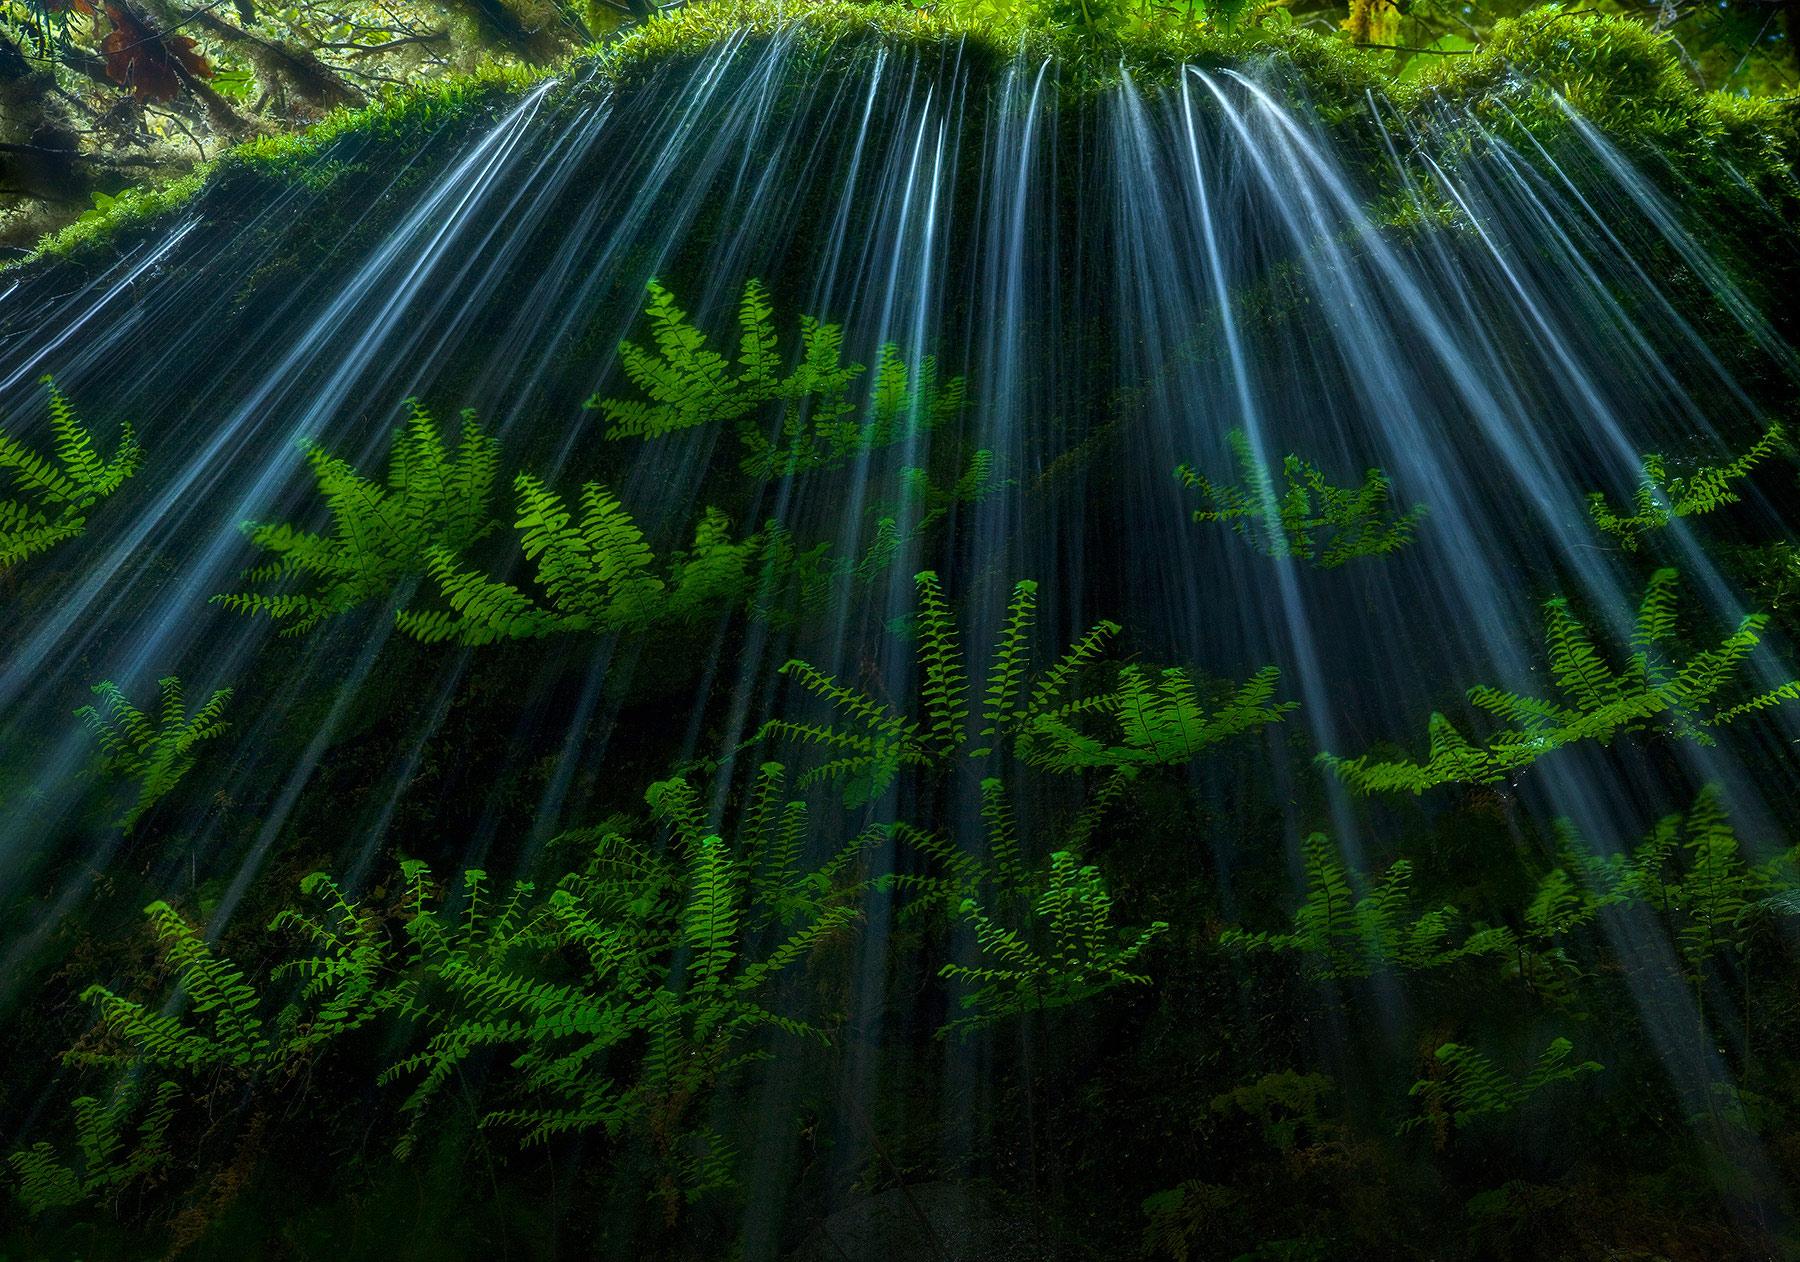 maiden fern, fern, spring, luminous, moss, cascade, oregon, columbia gorge, photo